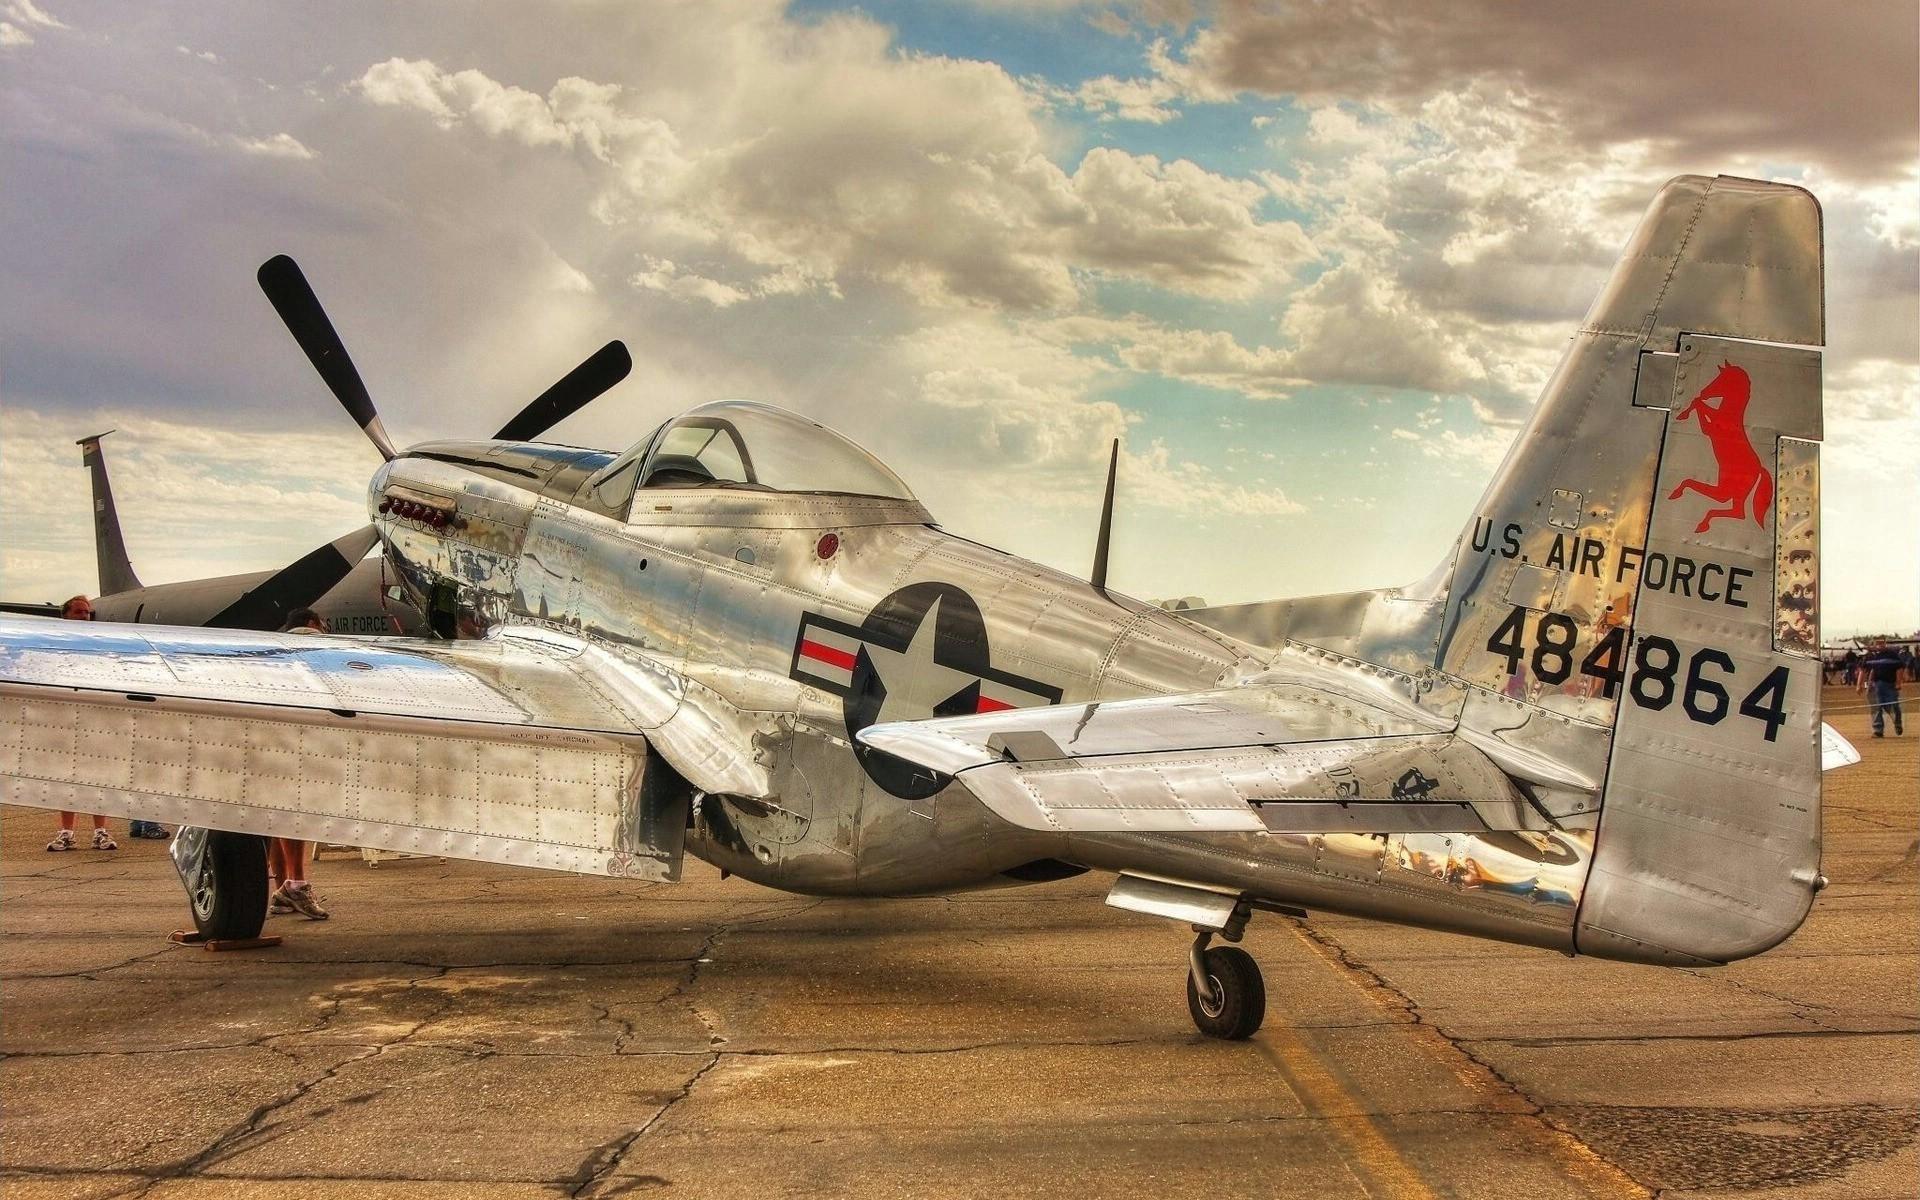 Download Vintage Aviation Wallpaper Free #ub0l9 px 373.82 KB  Other Commercial. Civil.